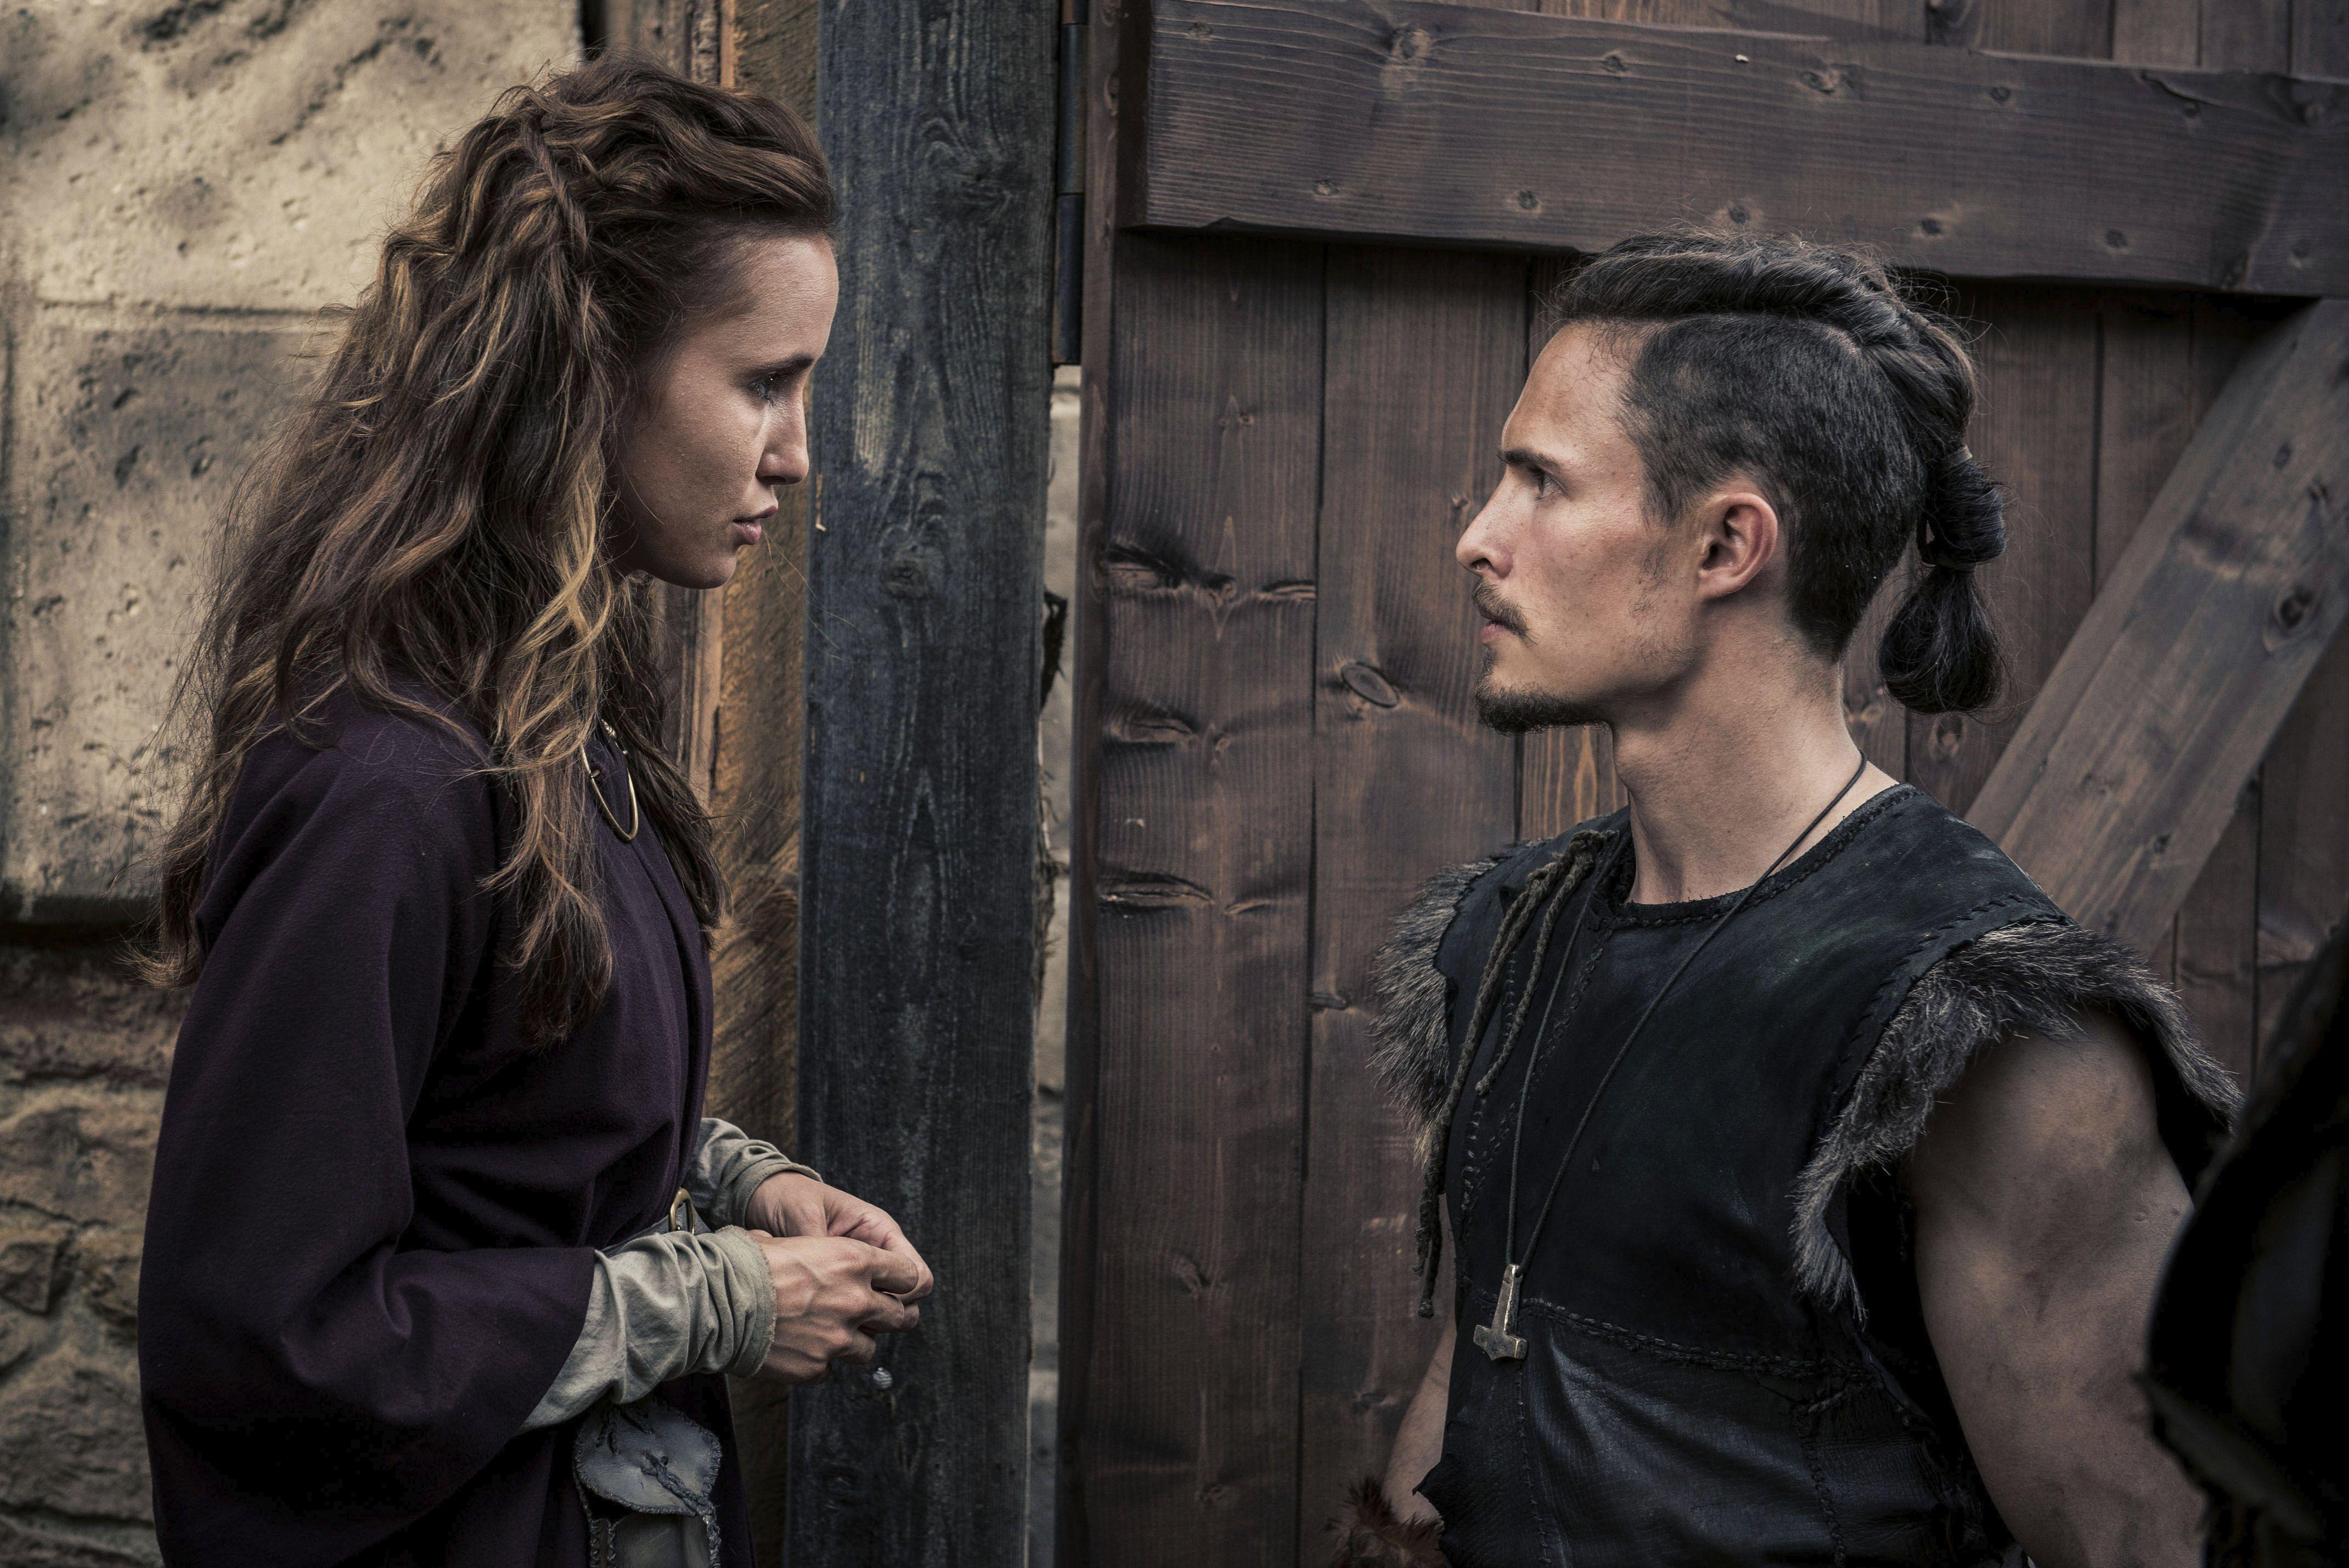 3 Temporada De The Last Kingdom the last kingdom - gisela and sihtric